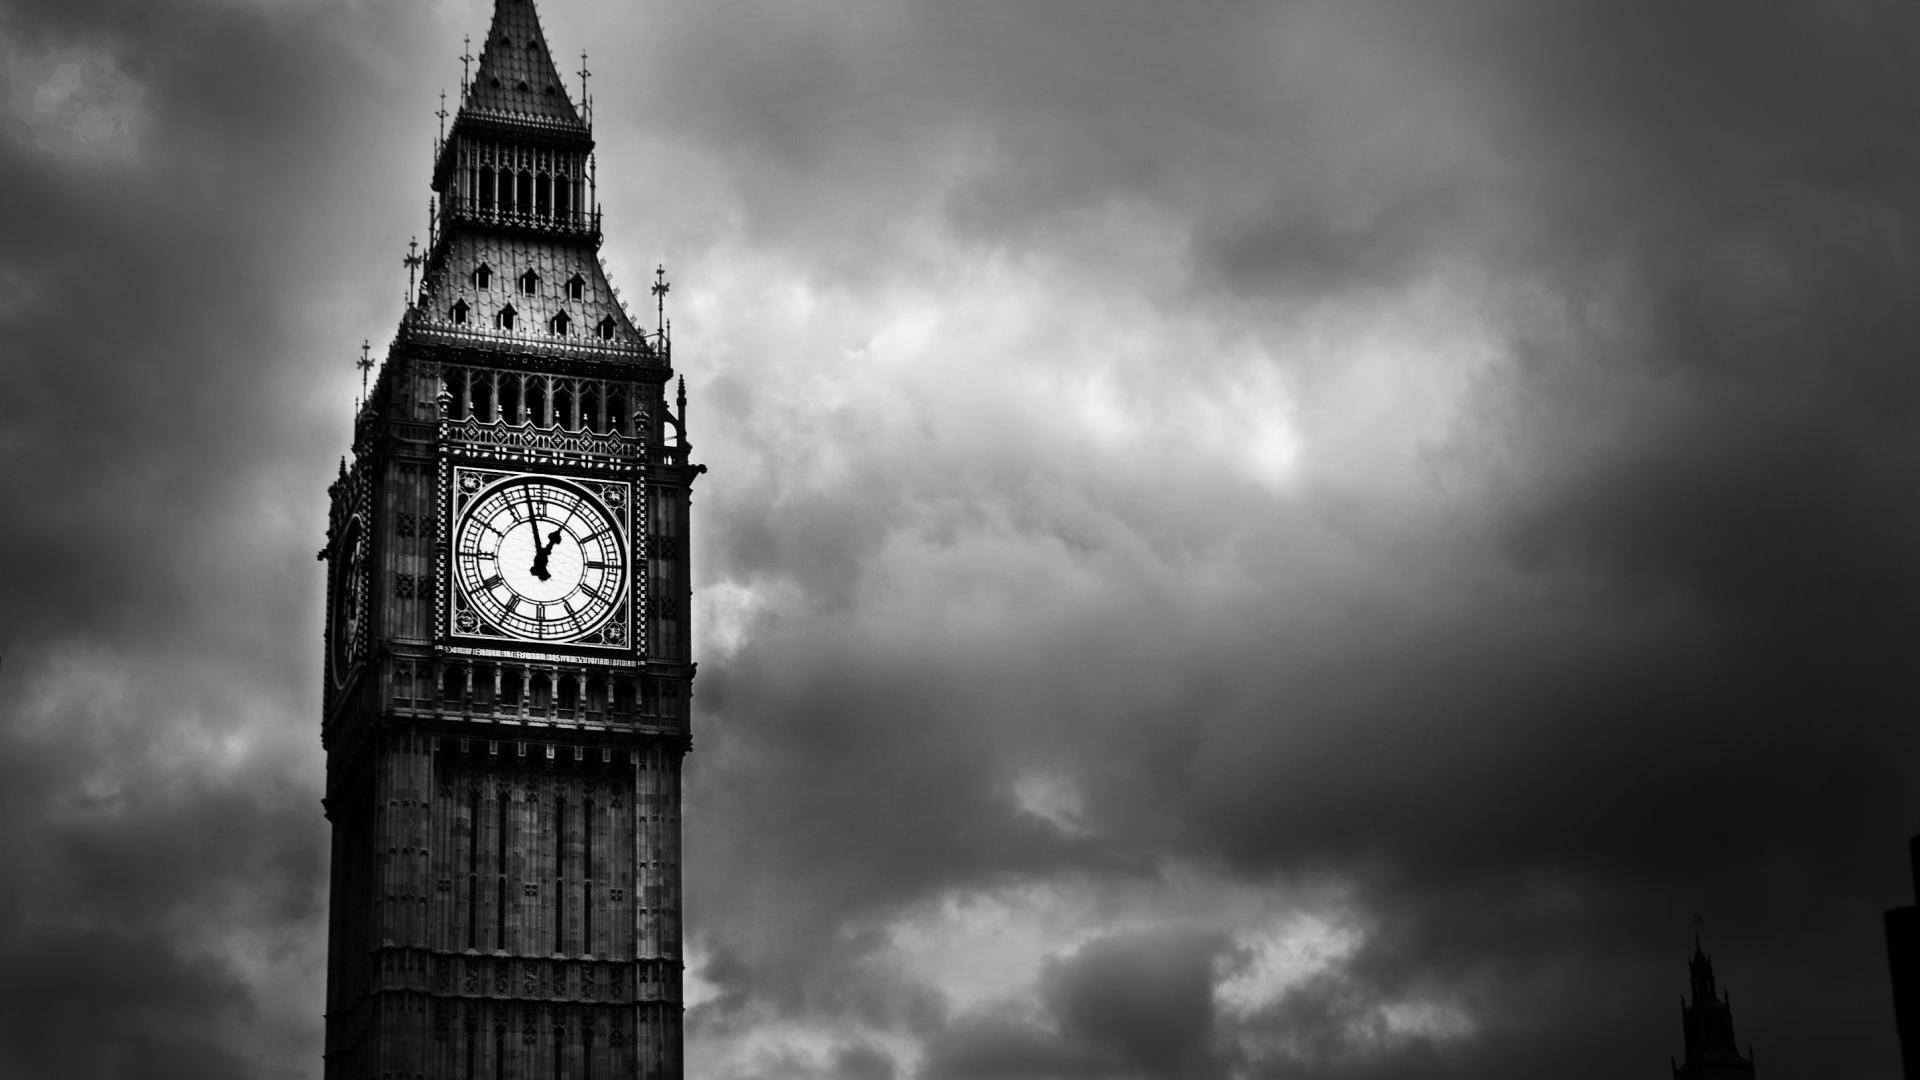 London Black And White Wallpapers Desktop Background - Obaasima com